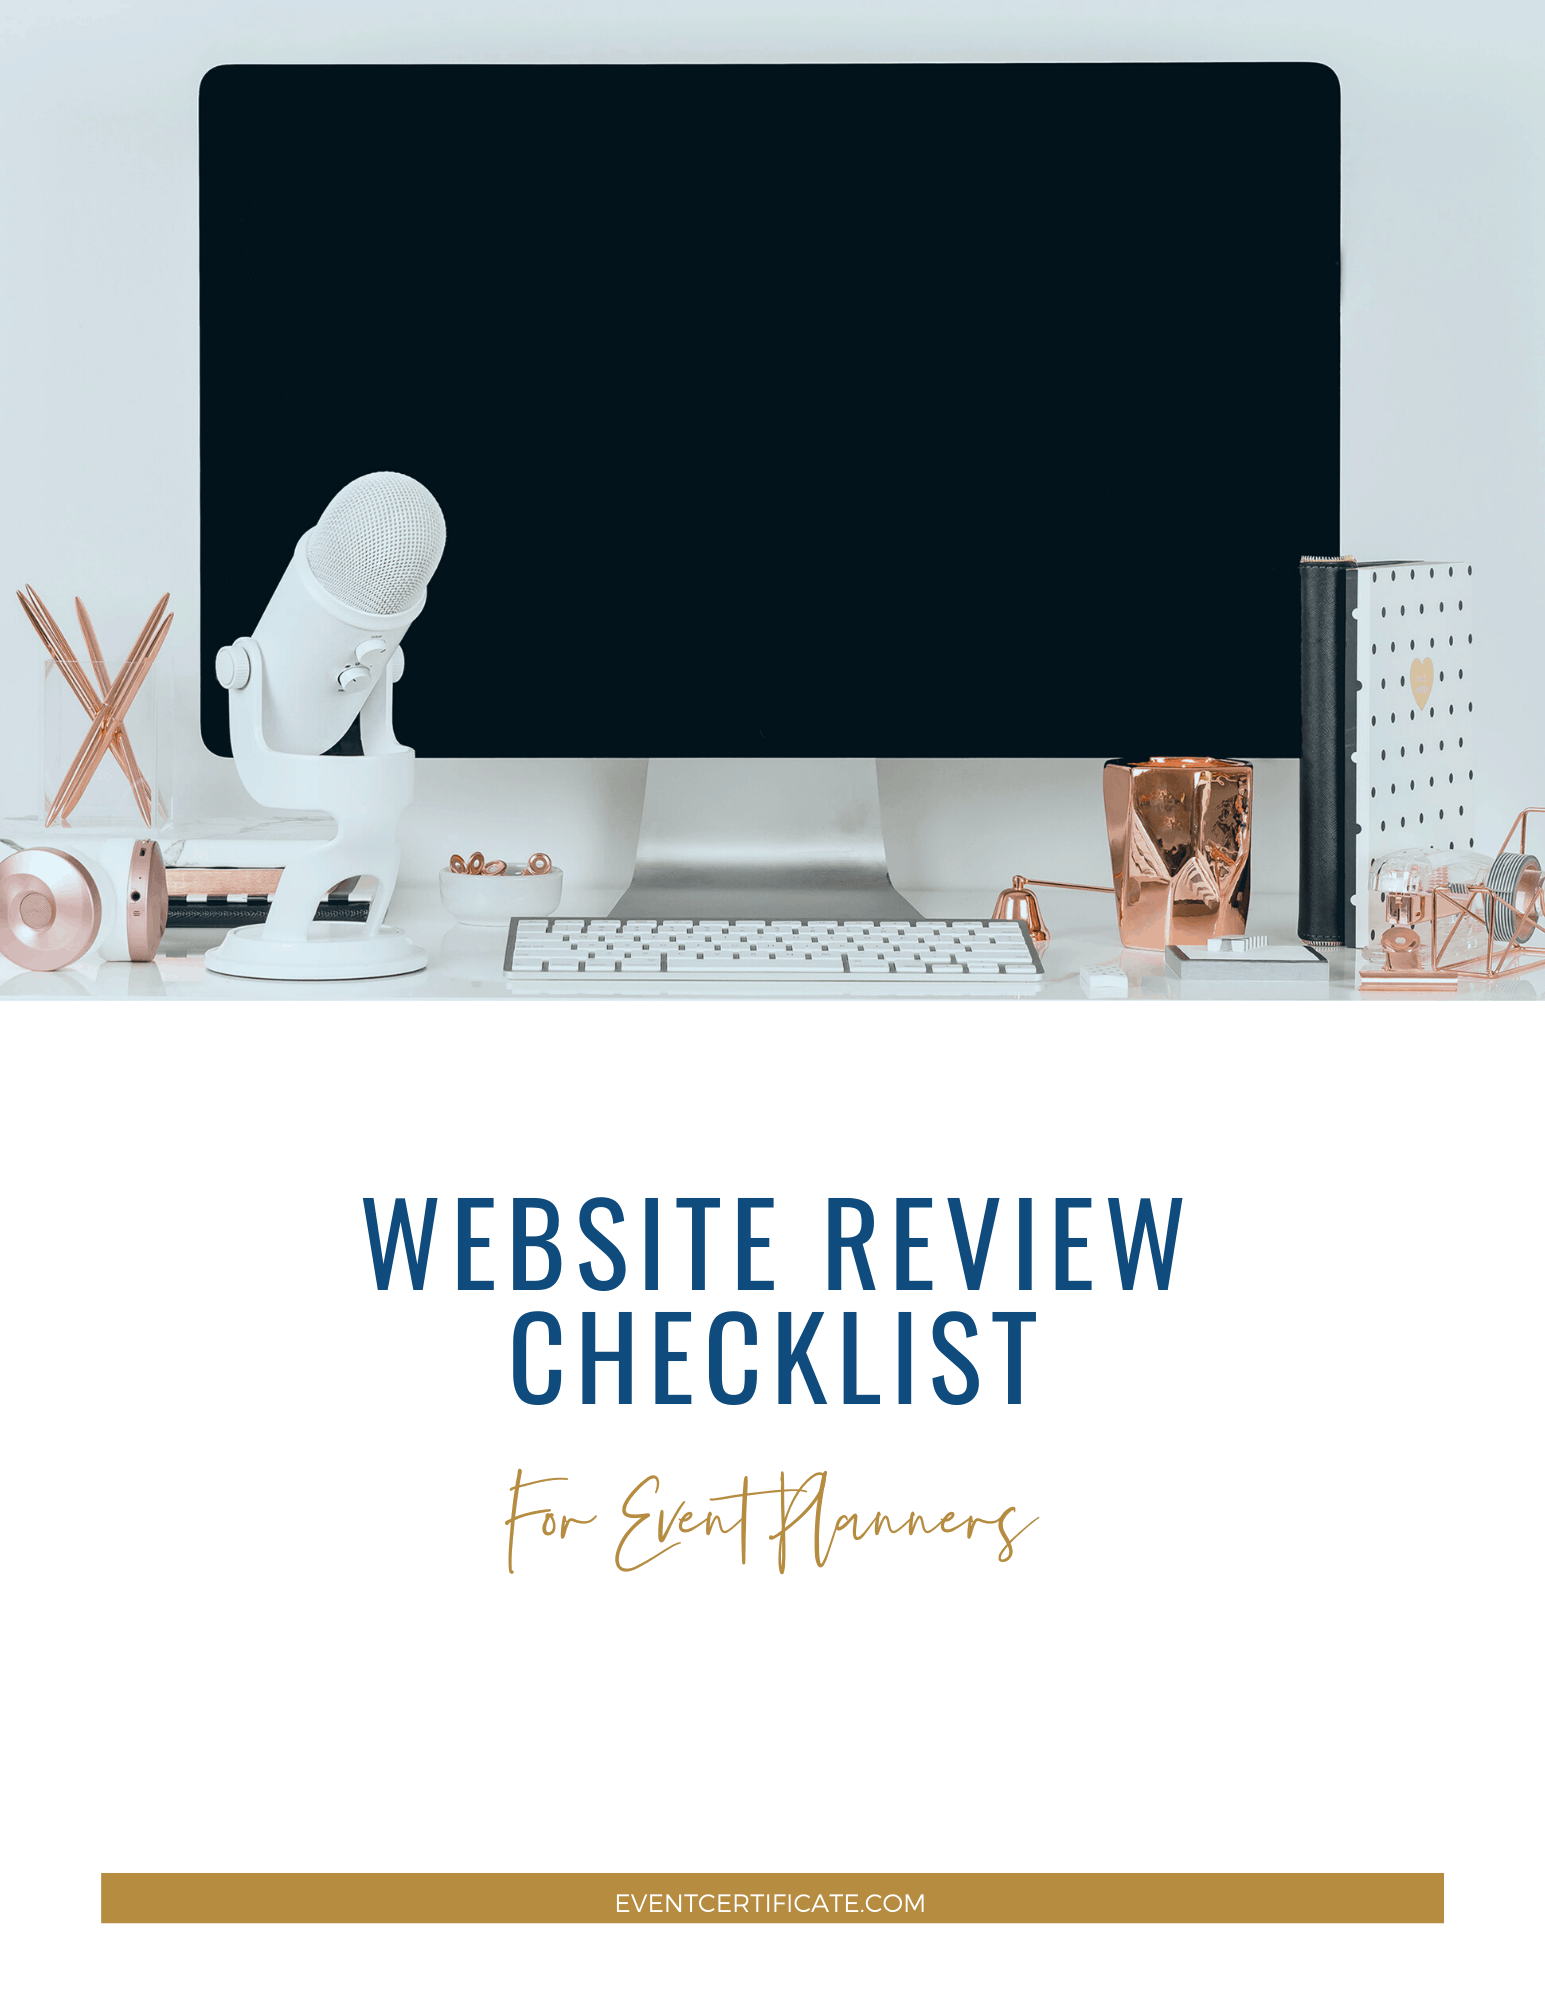 Website Review Checklist